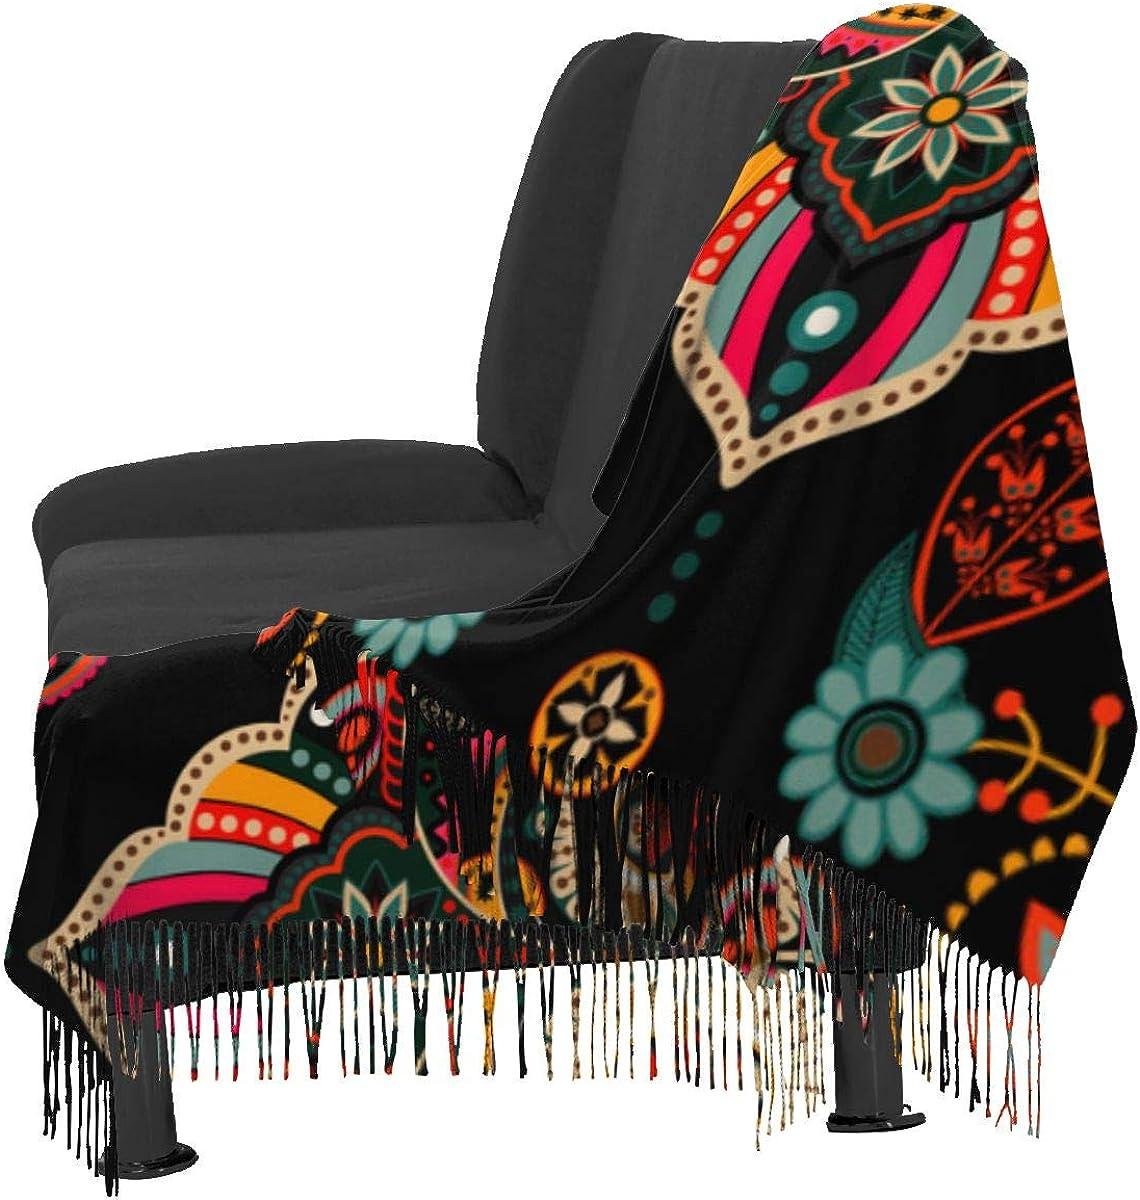 Ornamental Pattern Arabian Style Colorful Womens Scarf Large Long Blanket Check Wrap Shawl with Tassel 77x27 inch